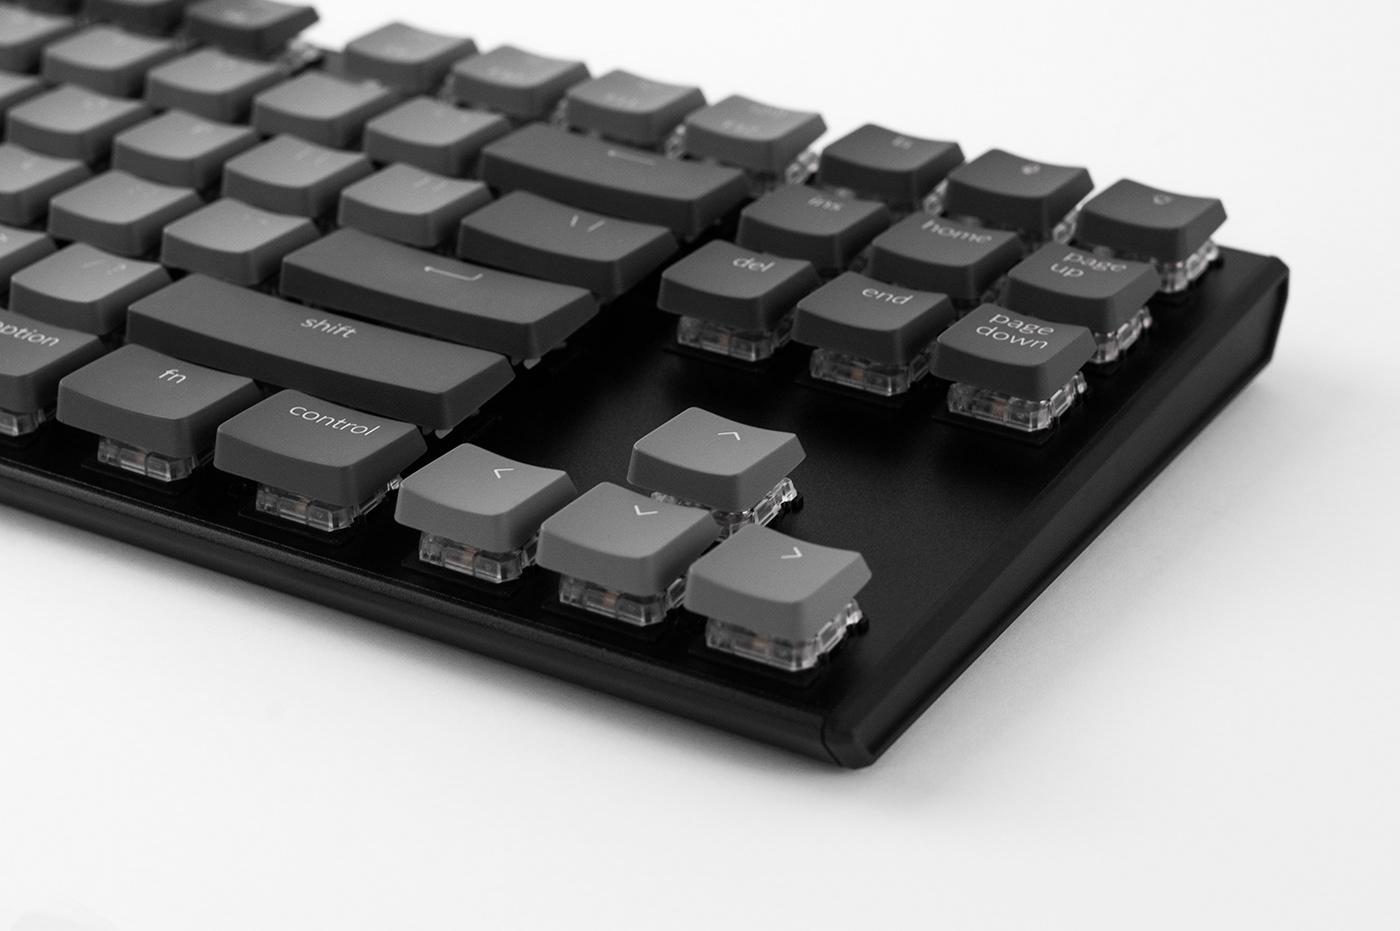 keyboard keychron keys Packshot Product Photography retouch